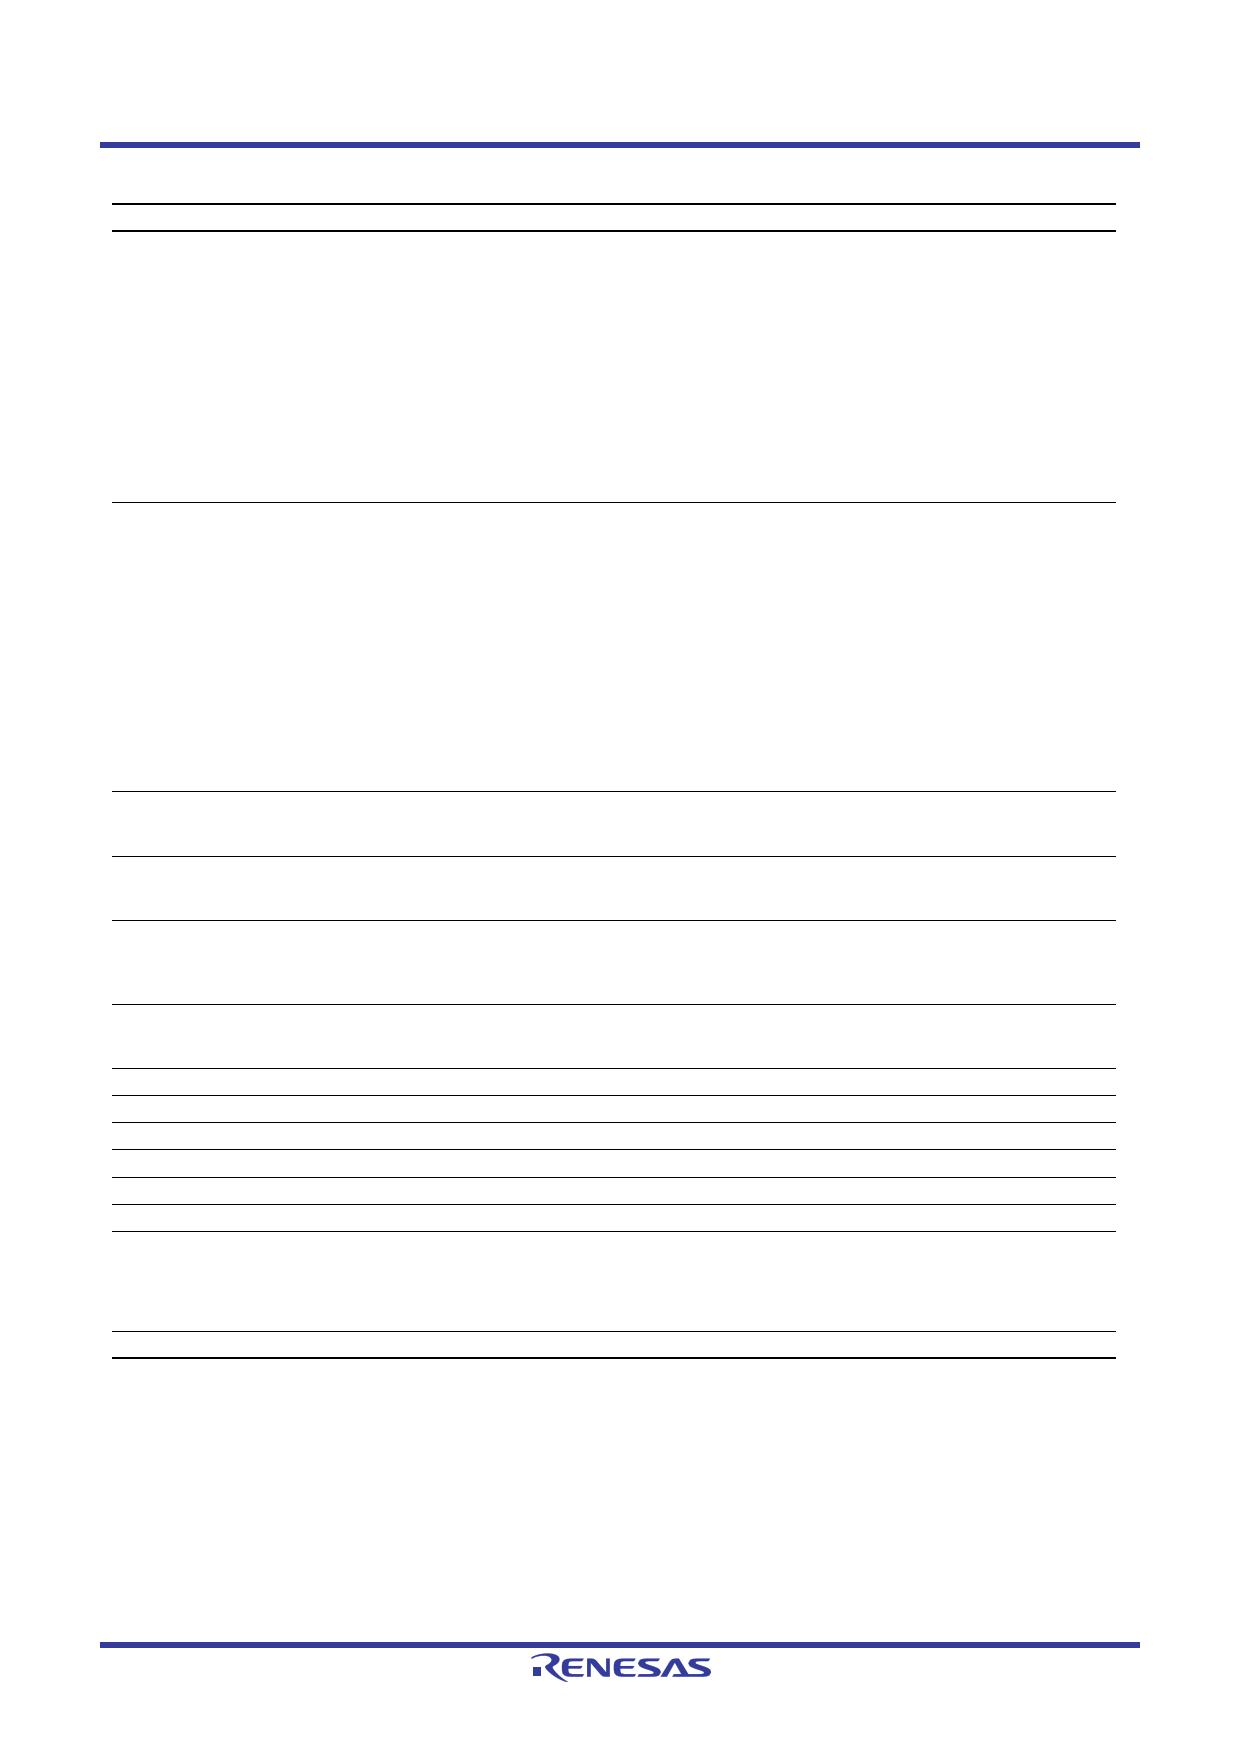 R5F51305ADFN pdf, 반도체, 판매, 대치품